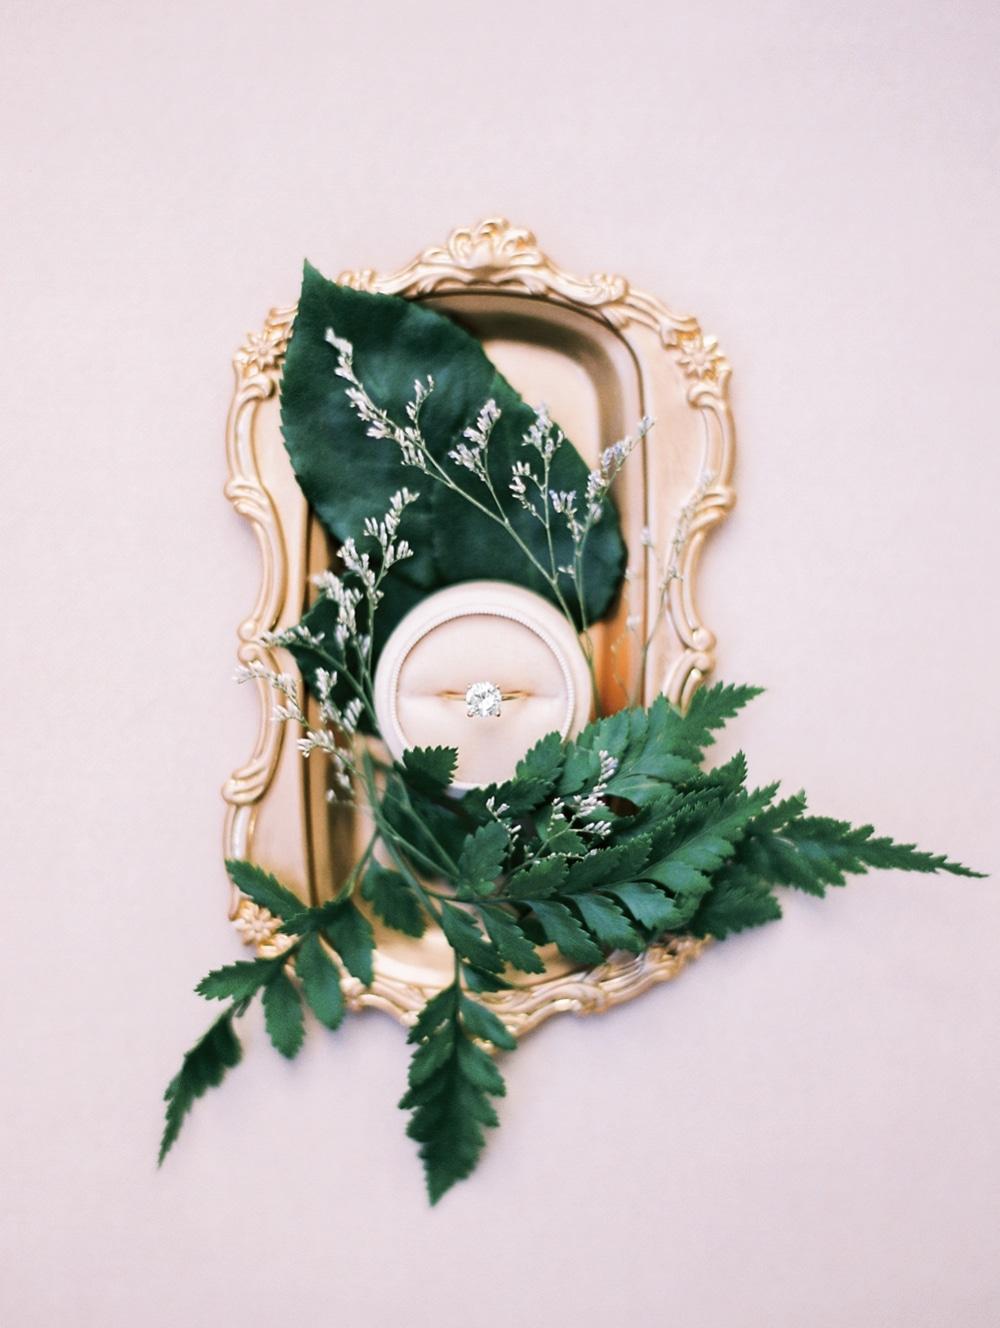 Kristin-La-Voie-Photography-fine-art-wedding-bridal-boudoir-texas-photographer-Dallas-Austin-San-Marcos-wahwahtaysee-resort-12